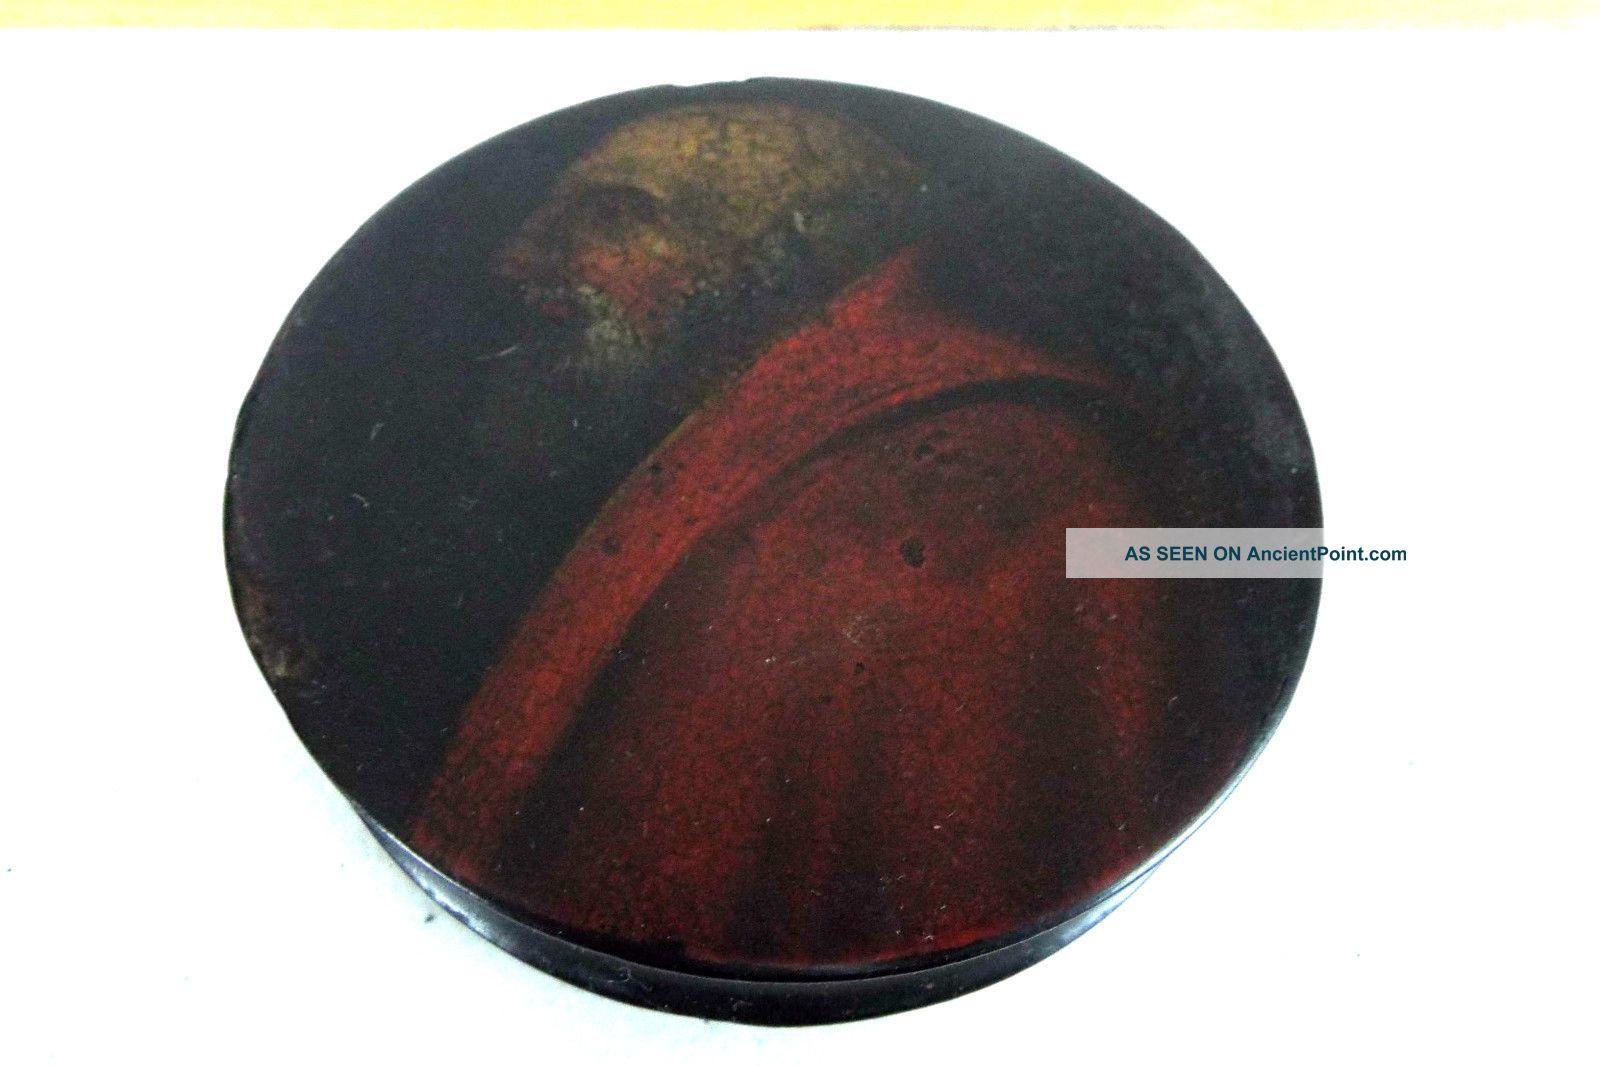 Antique Paper Mache Round Snuff Box Old World Portrait Circa 1820 Painting Trivets photo